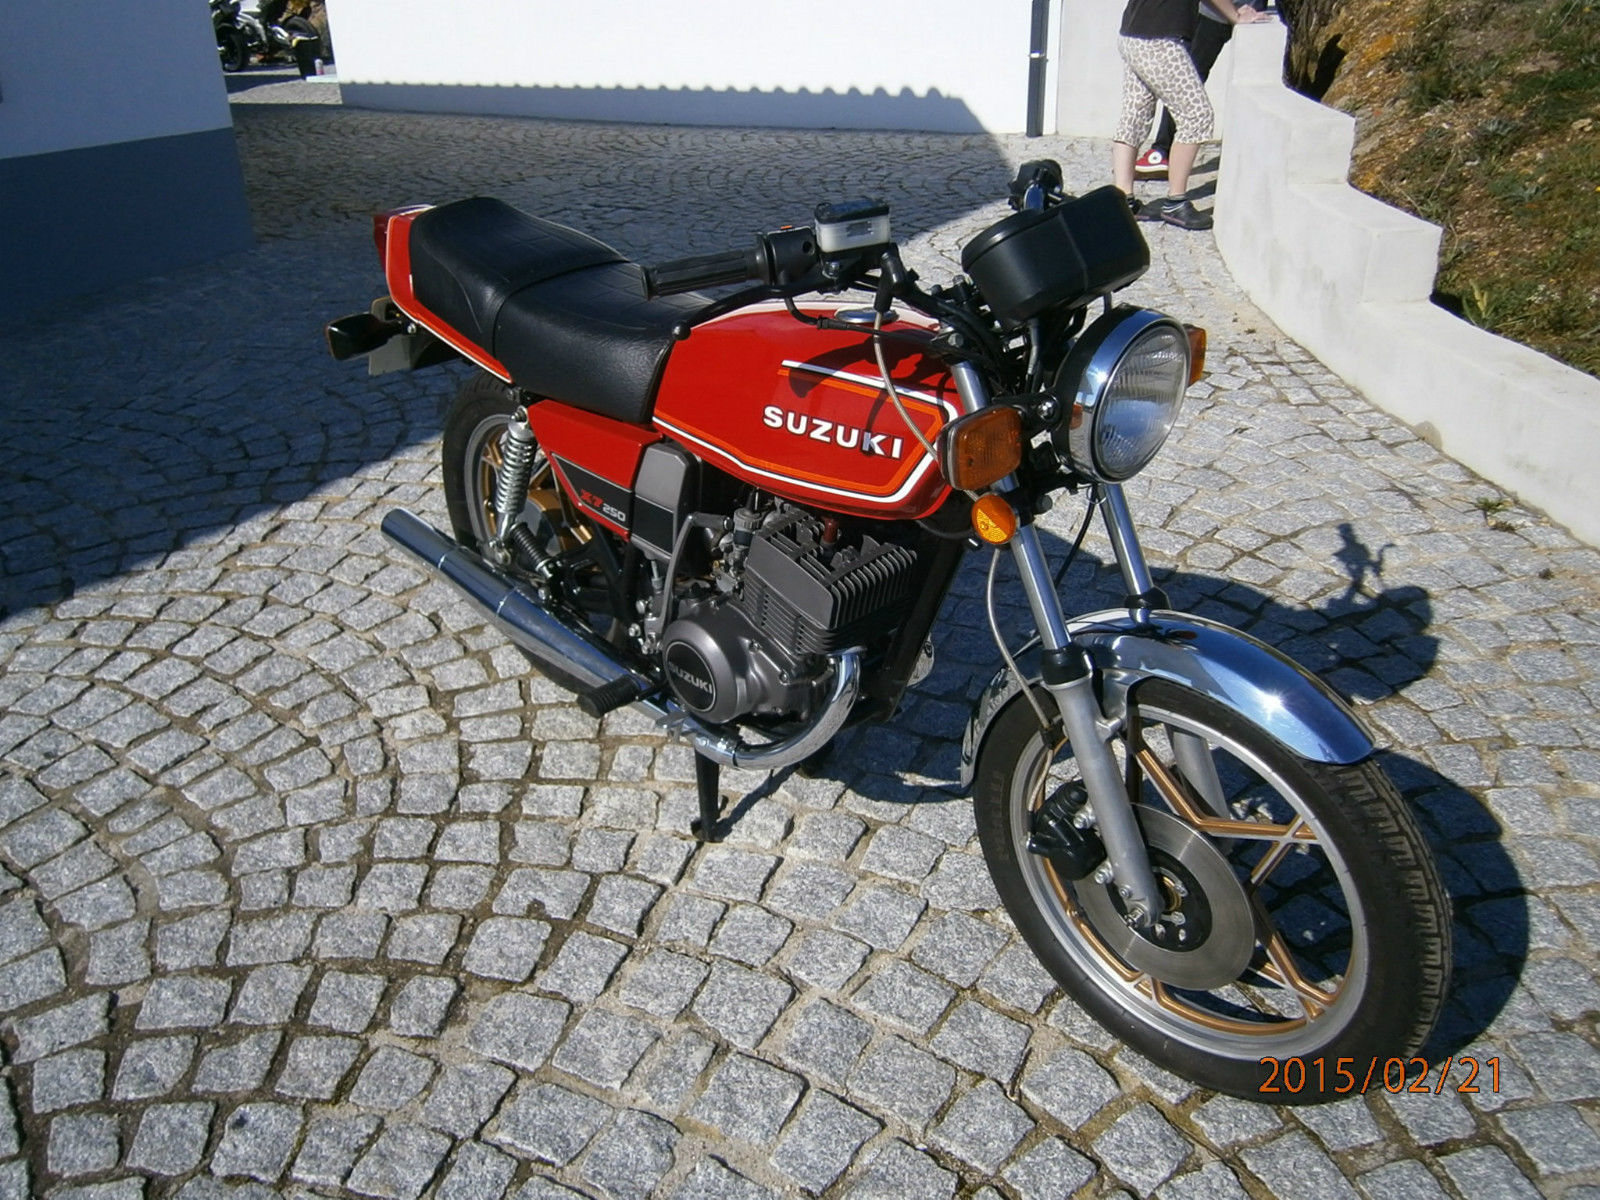 Restored Suzuki X7 1982 Photographs At Classic Bikes Restored Bikes Restored